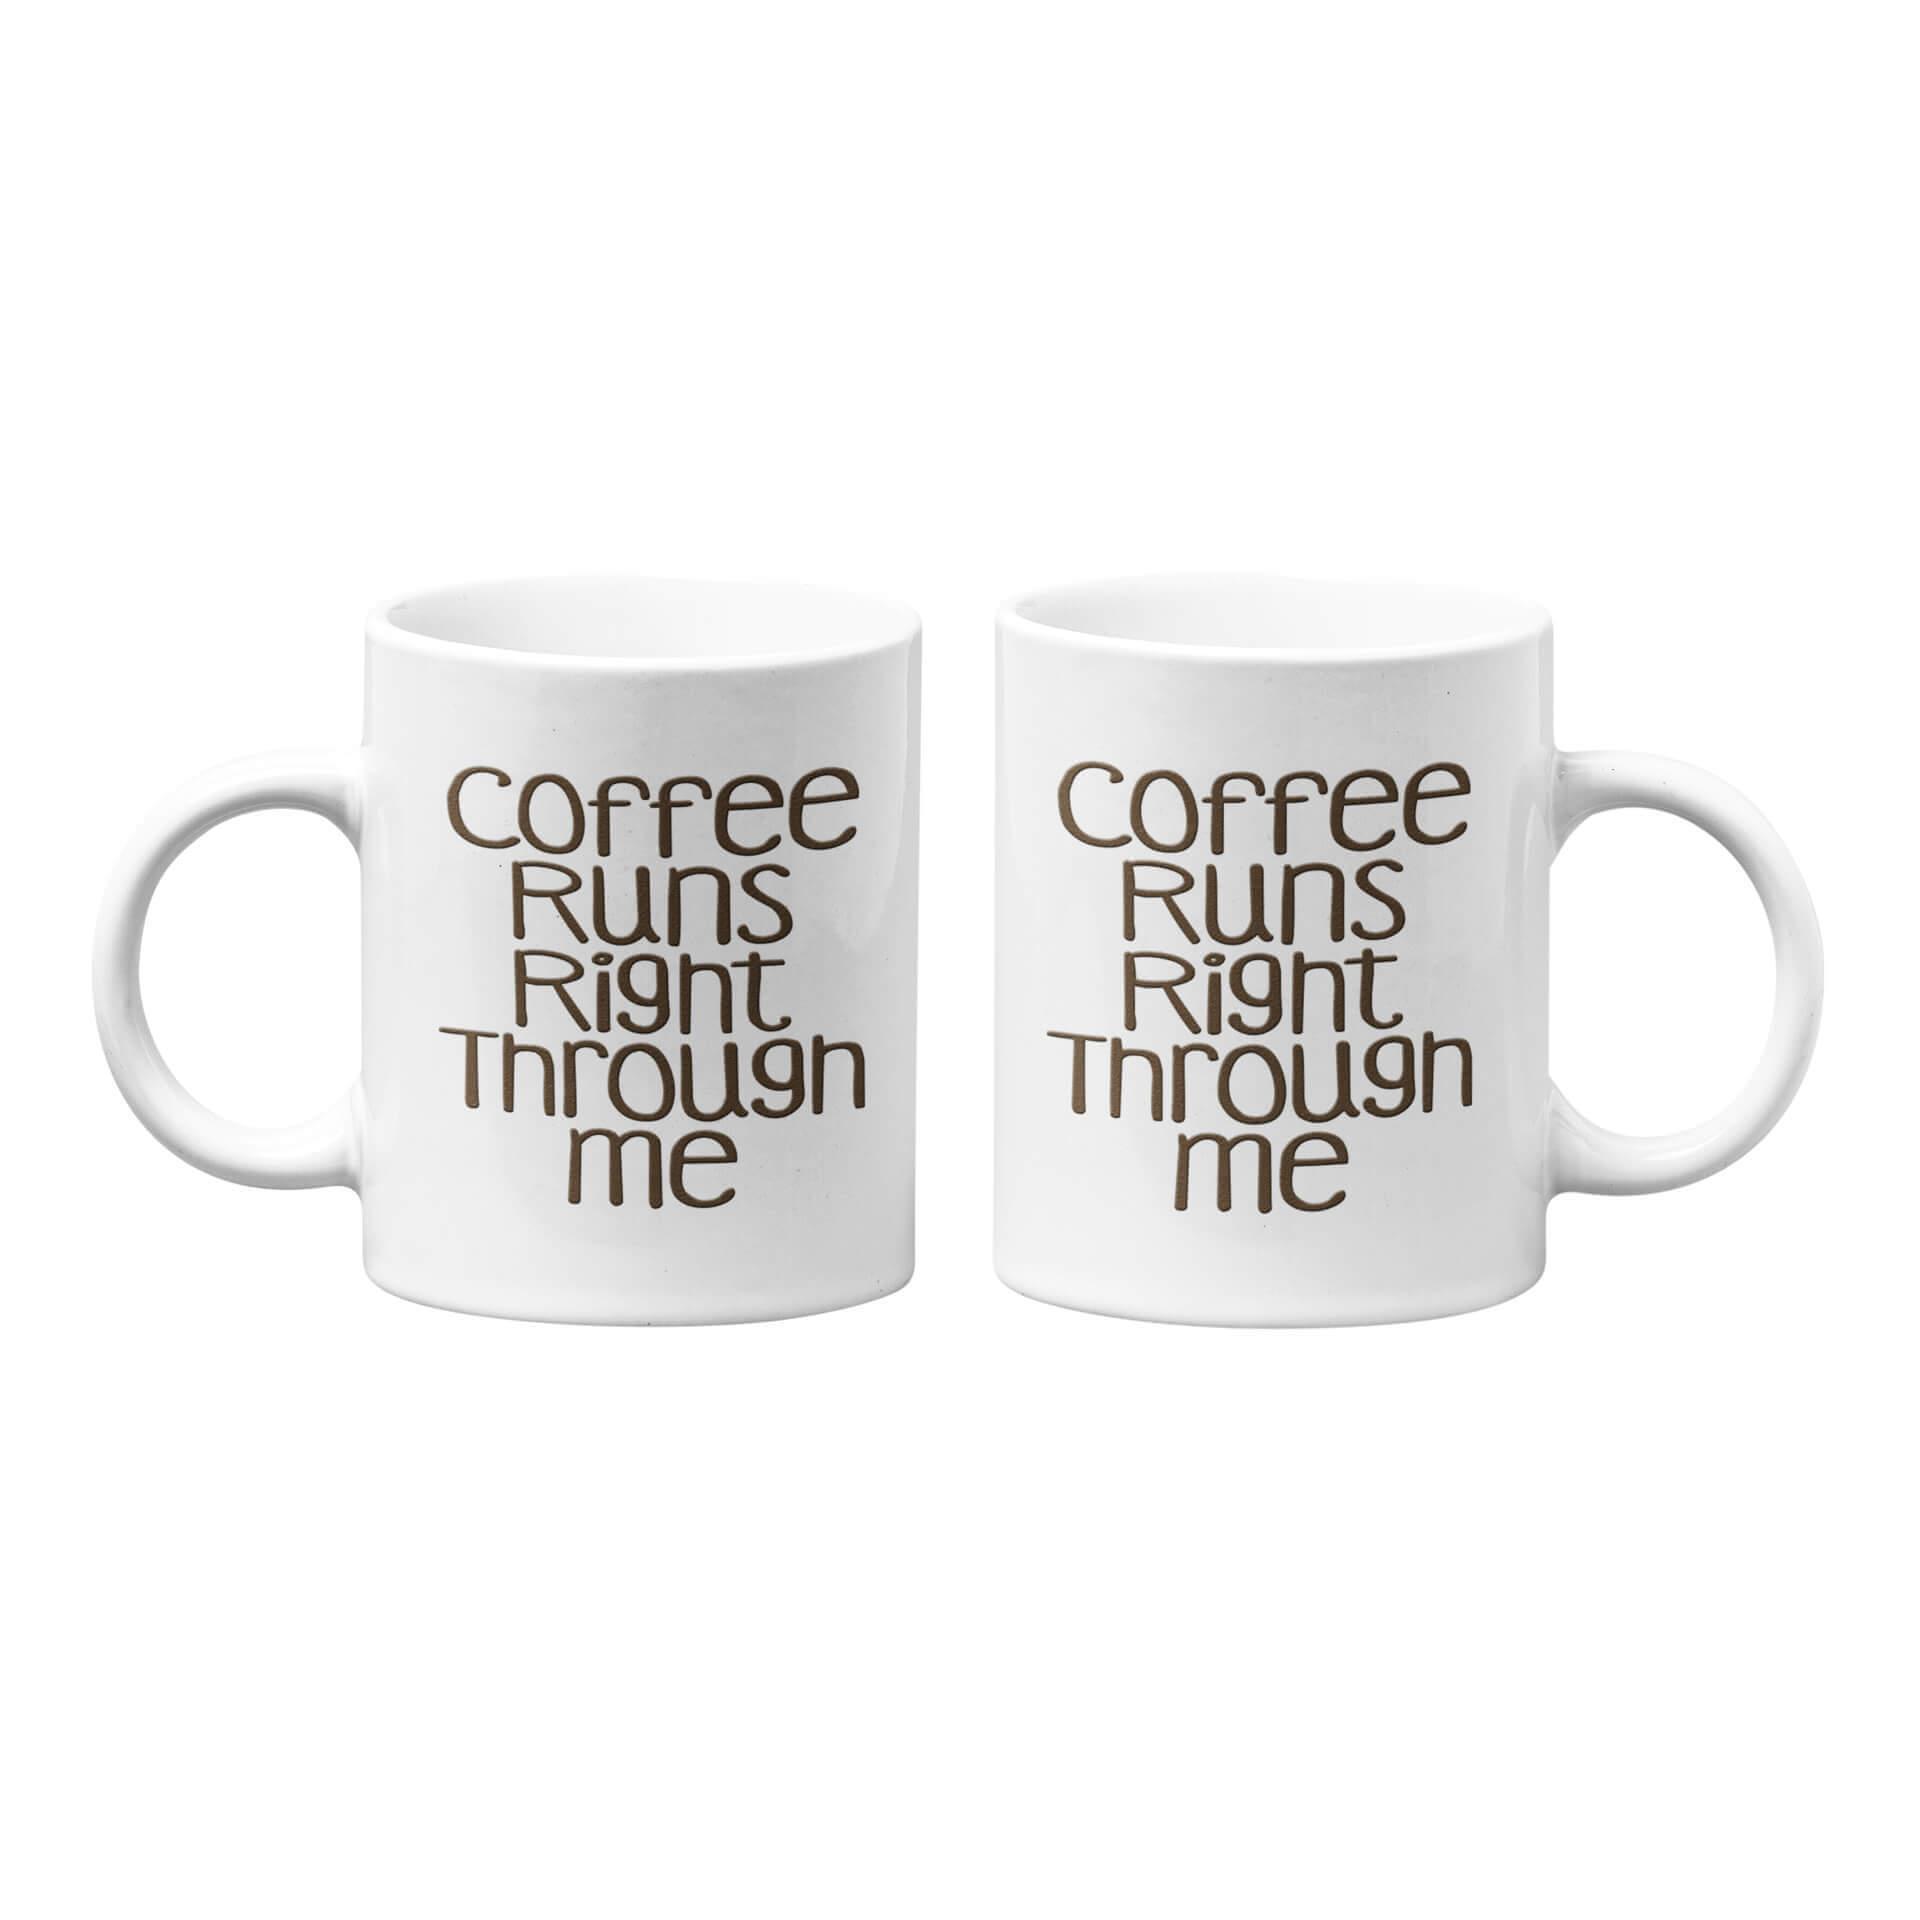 Coffee Runs Right Through Me Mug